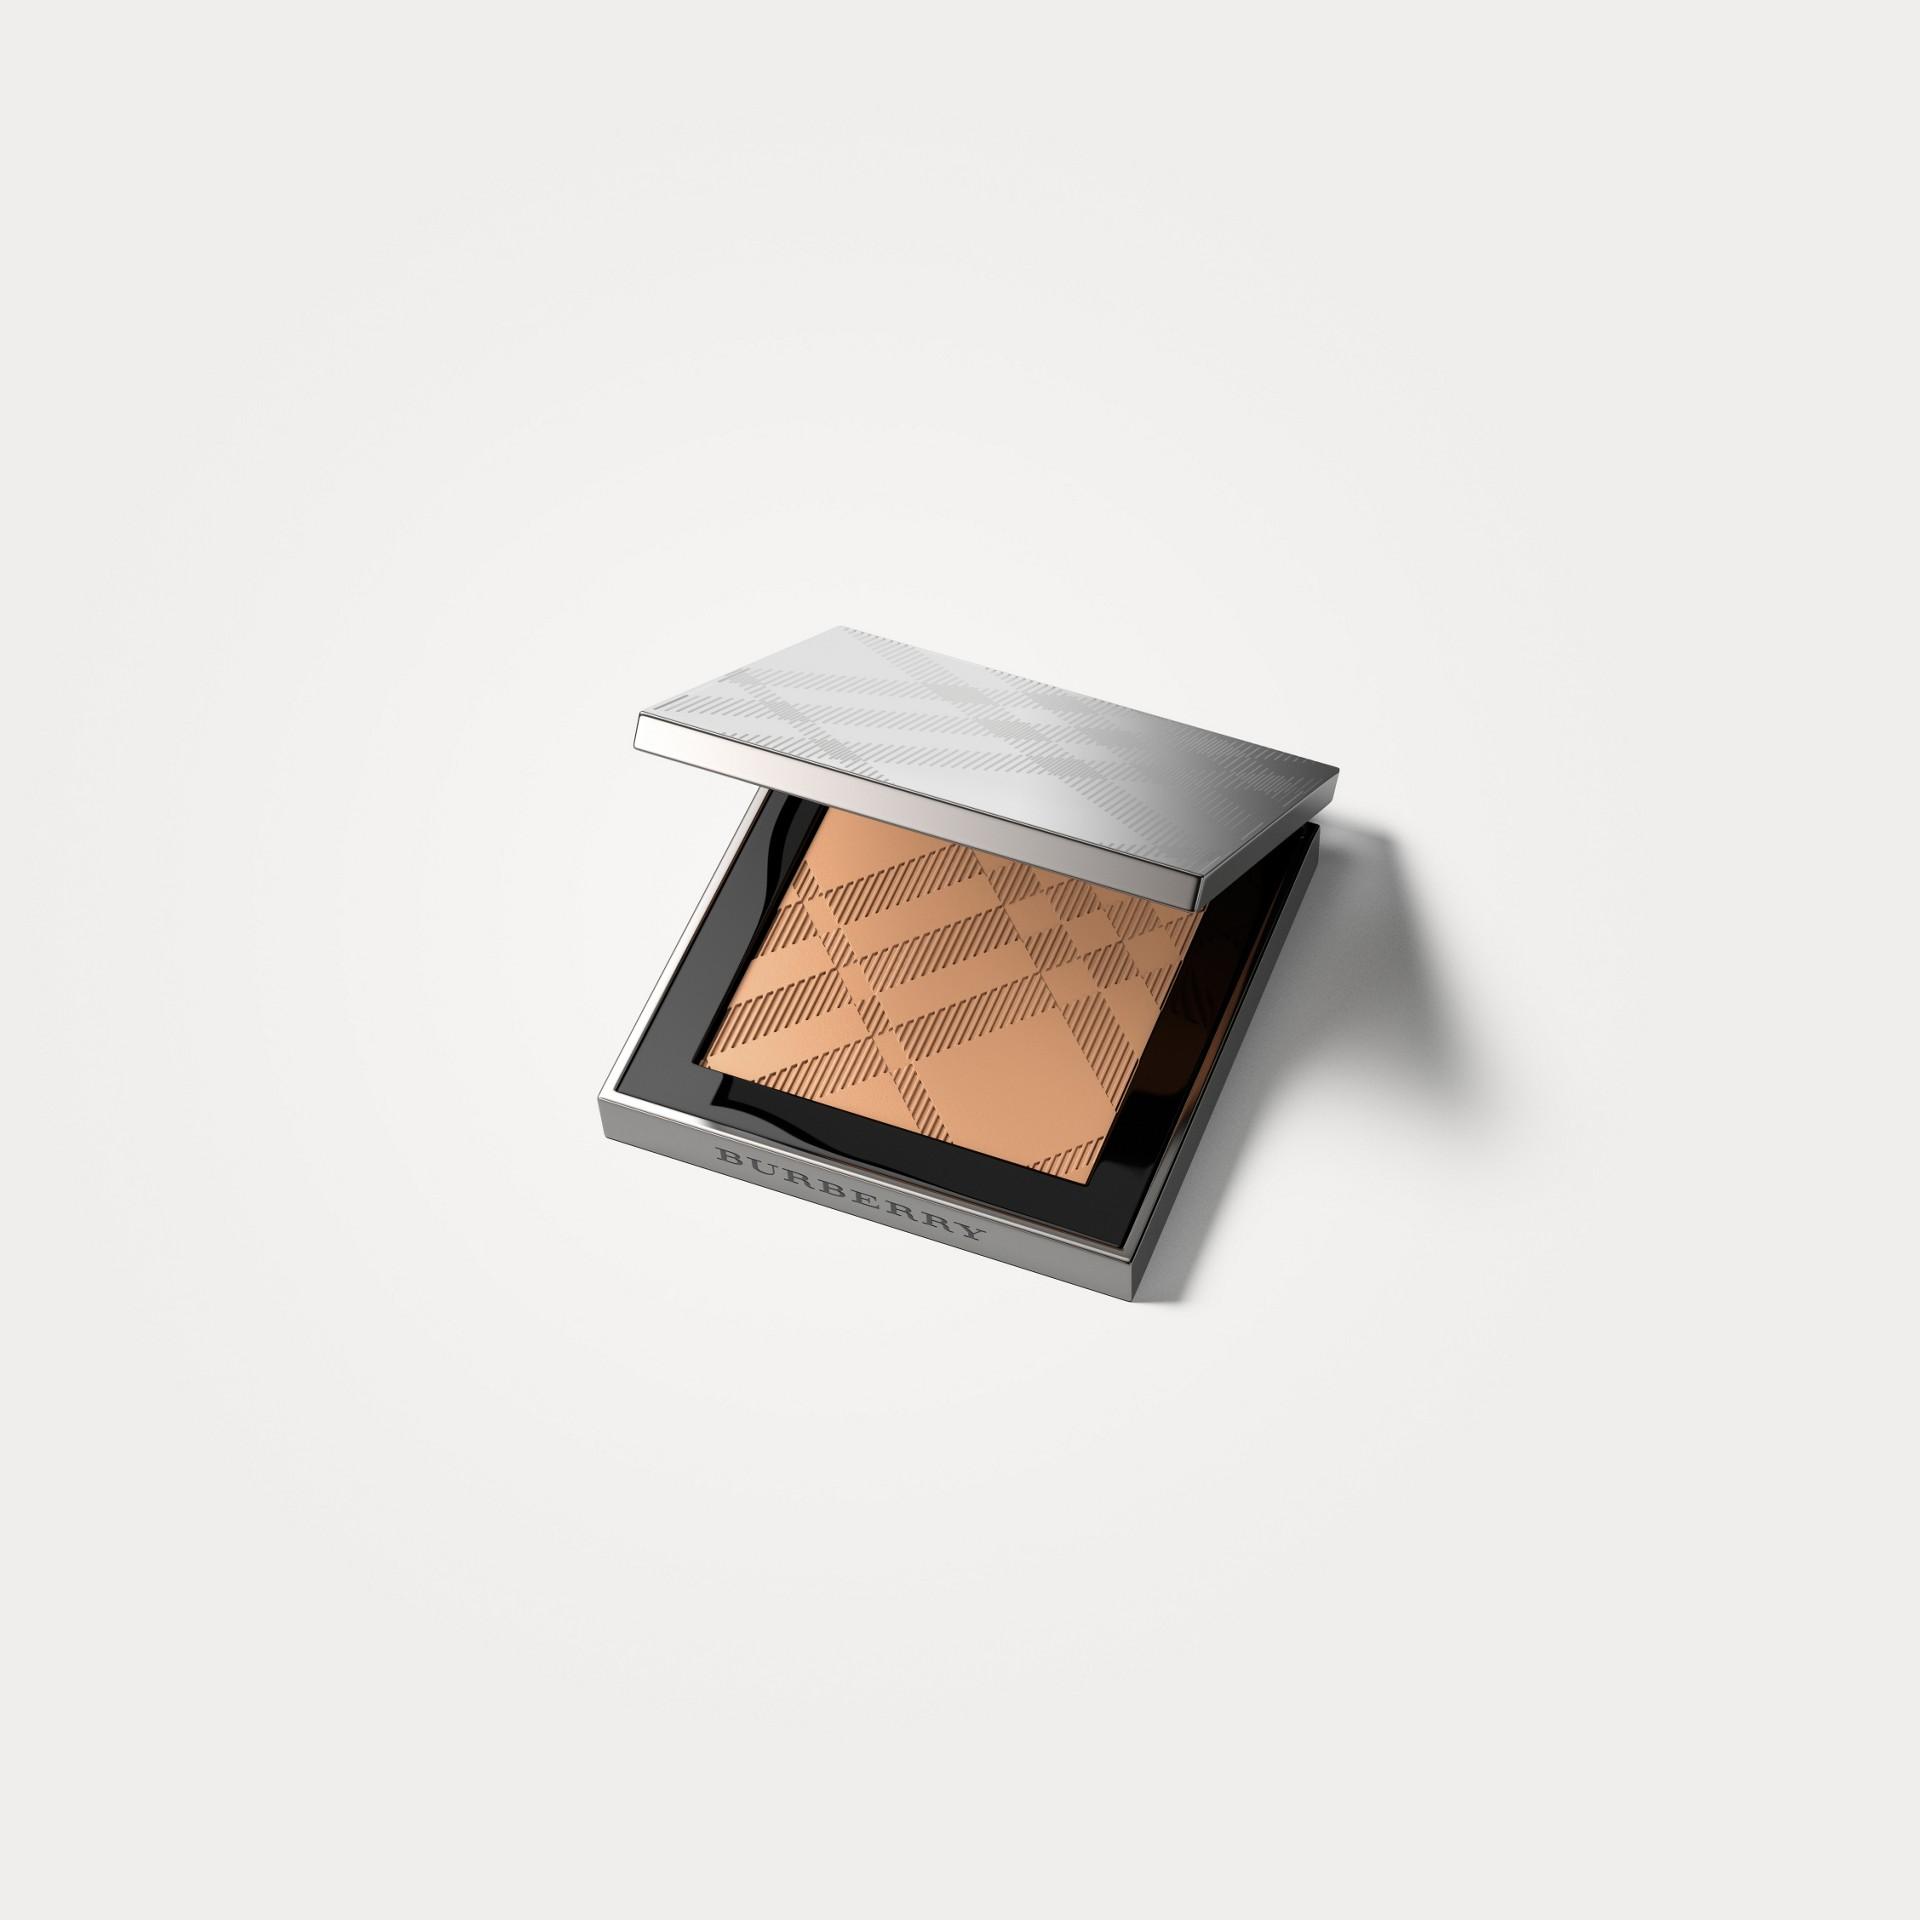 Warm honey 38 Nude Powder – Warm Honey N0.38 - gallery image 1